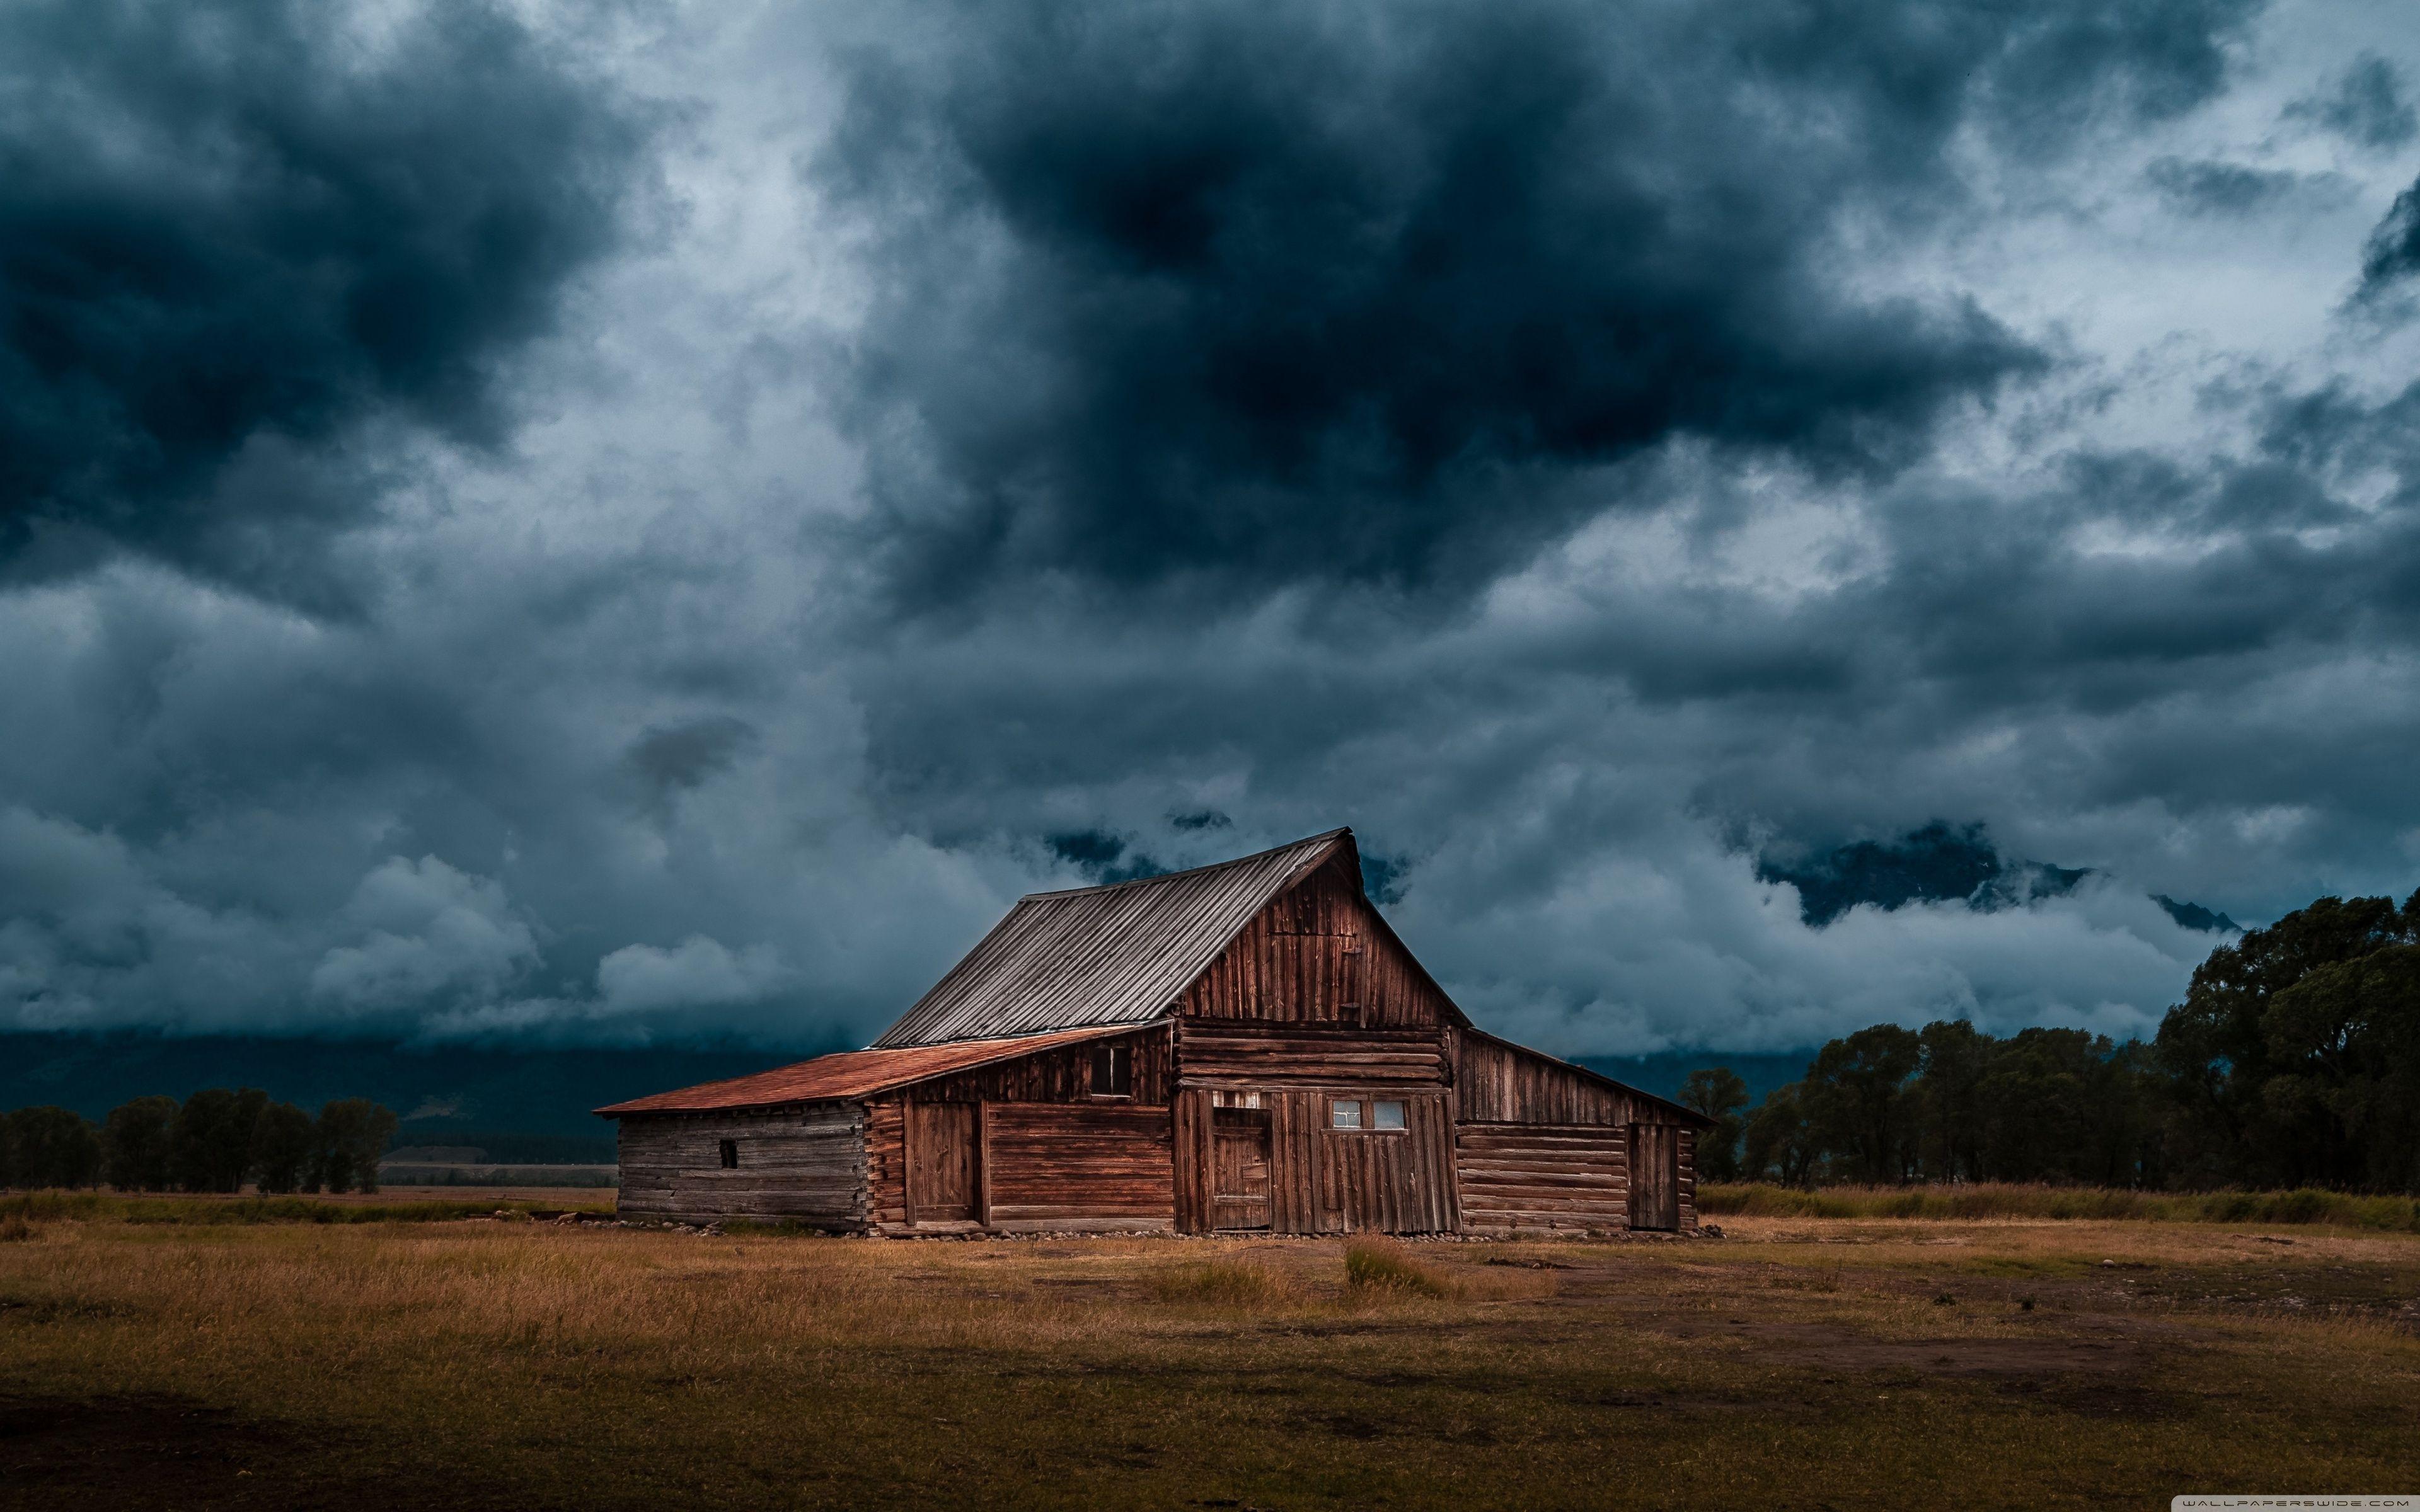 55 Farm Storm Wallpapers   Download at WallpaperBro 3840x2400